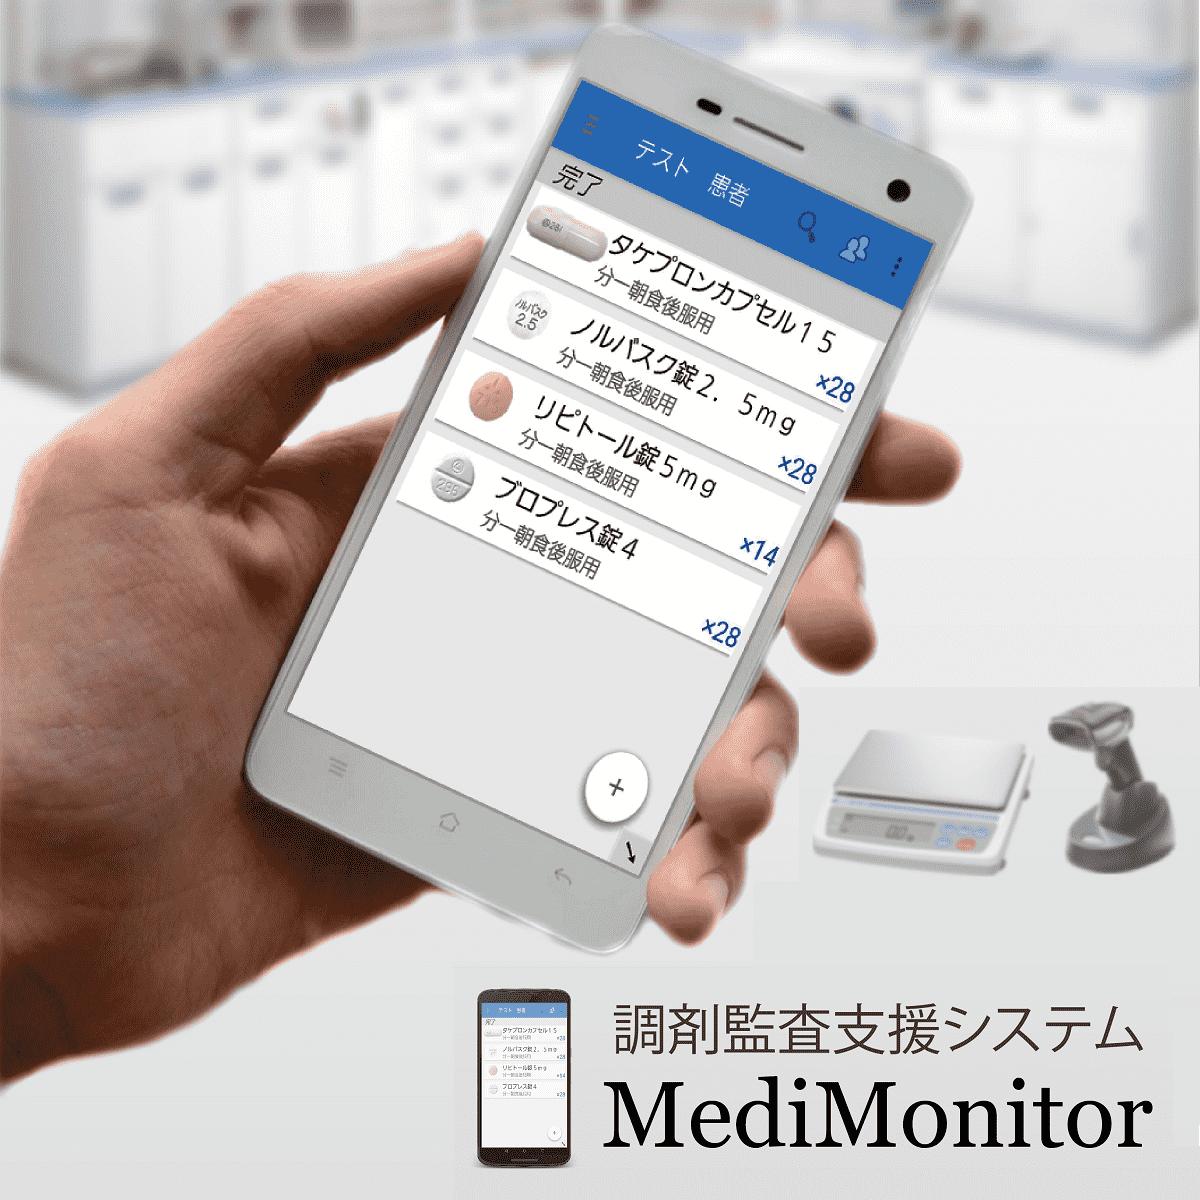 medimonitor_flyer_1200px_optimized